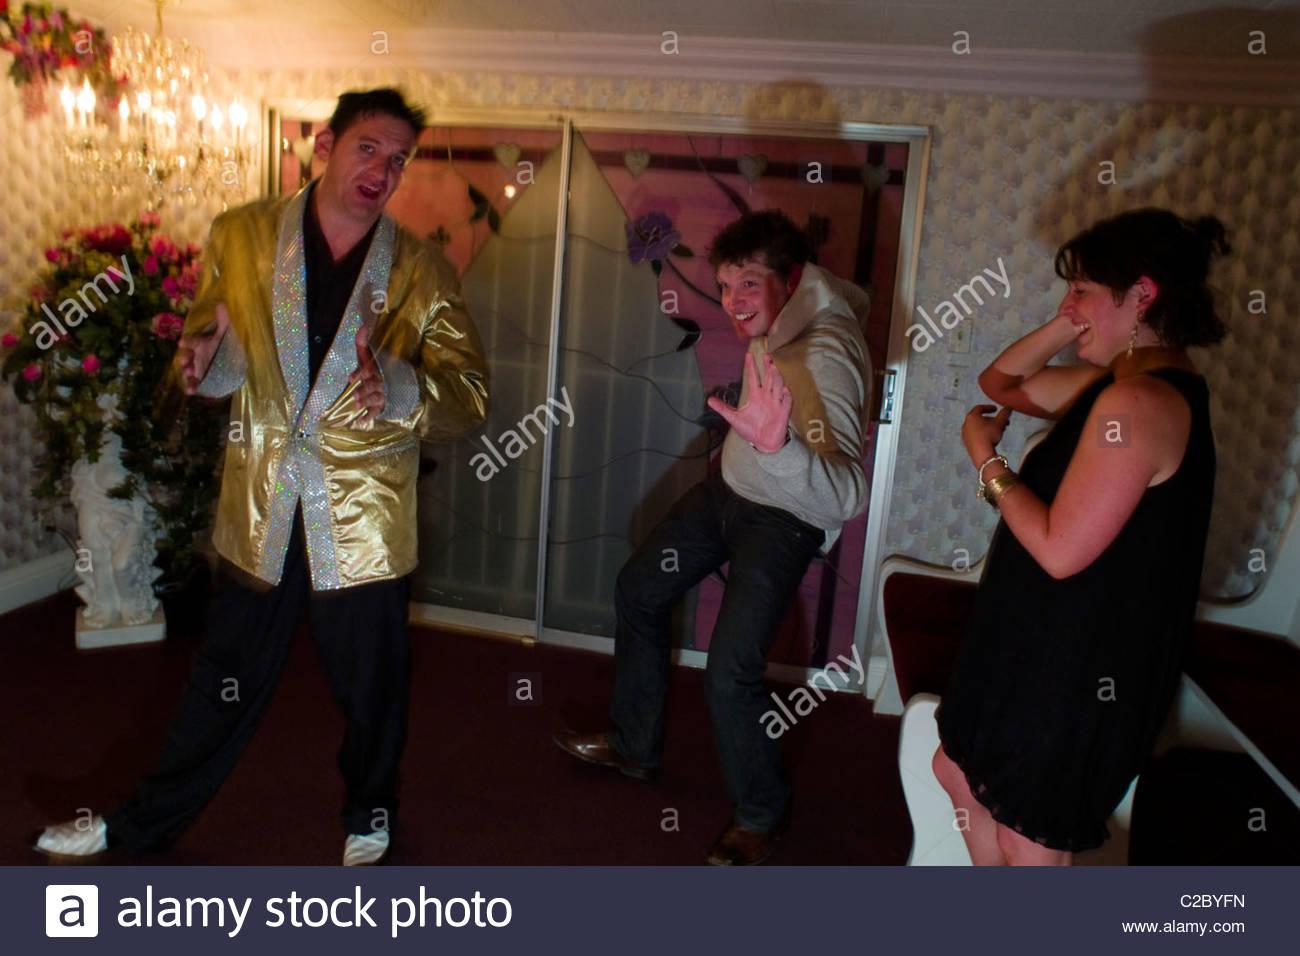 An Elvis impersonator serenades an Irish couple at a wedding chapel. - Stock Image